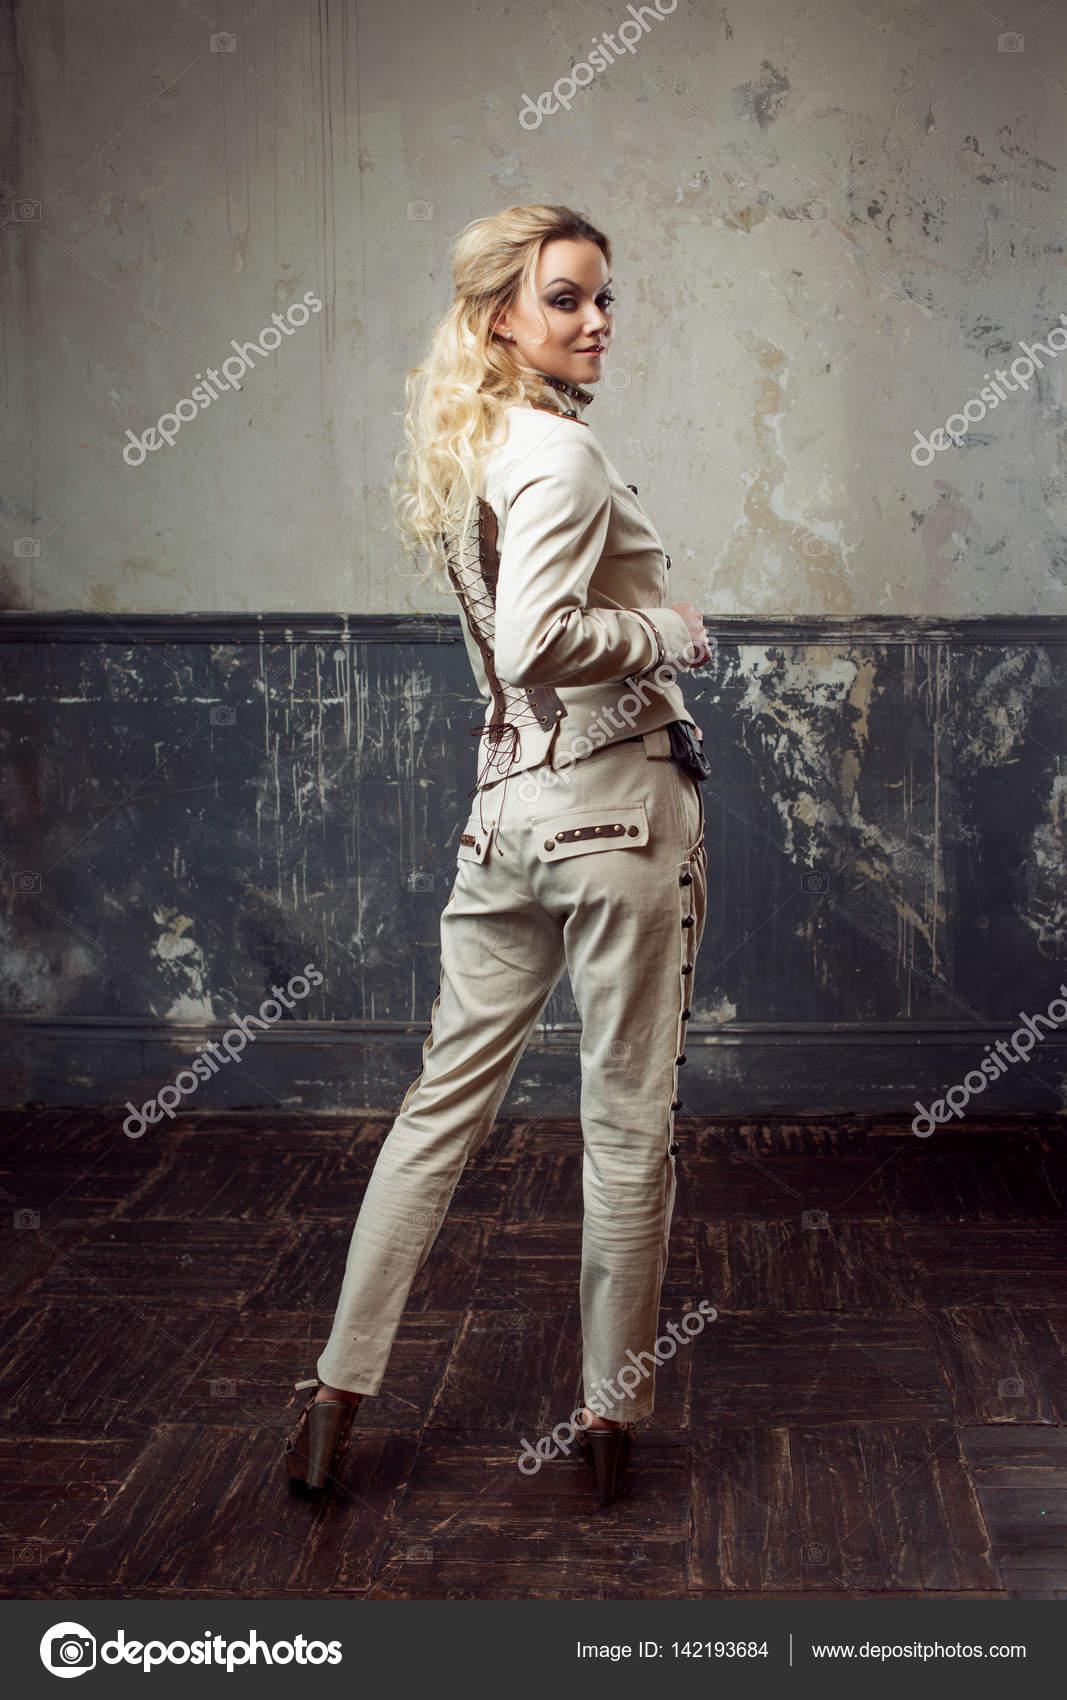 d10e4da836f Προσωπογραφία γυναίκας όμορφη steampunk πέρα από το υπόβαθρο του grunge —  Φωτογραφία Αρχείου